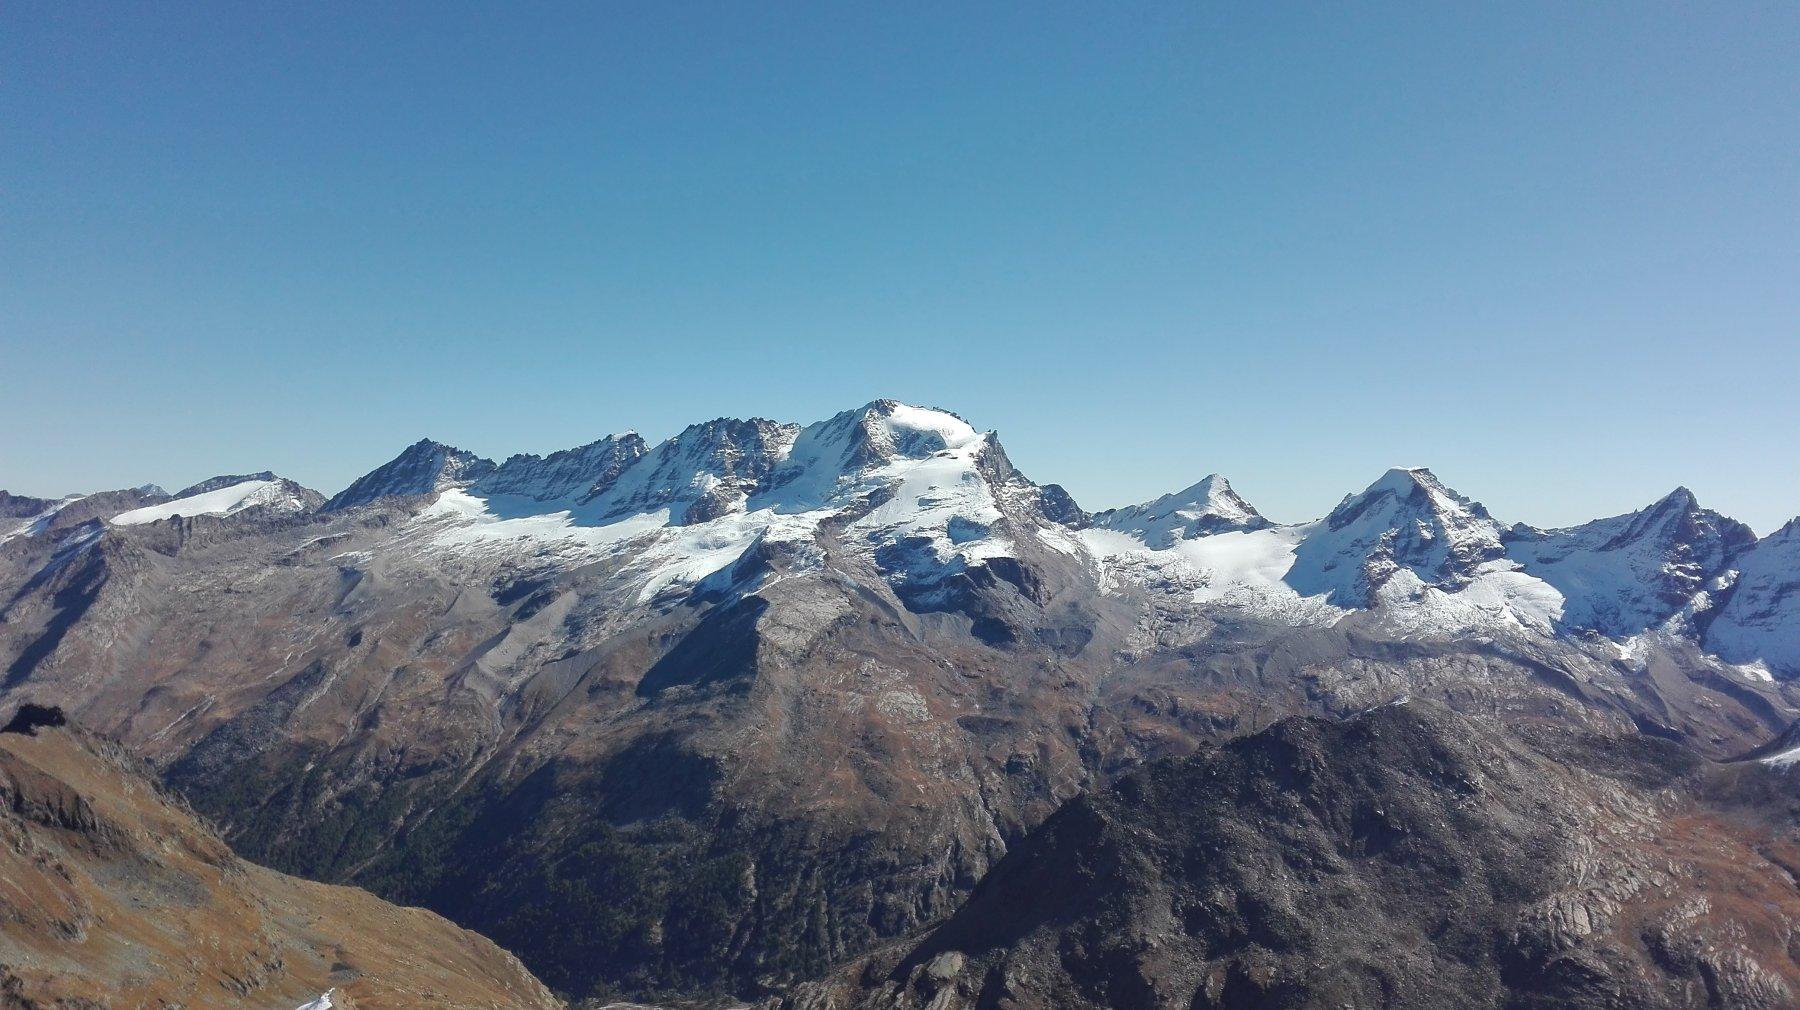 dalla cima: Gran Paradiso, Tresenta, Ciarforon, Becca di Monciair